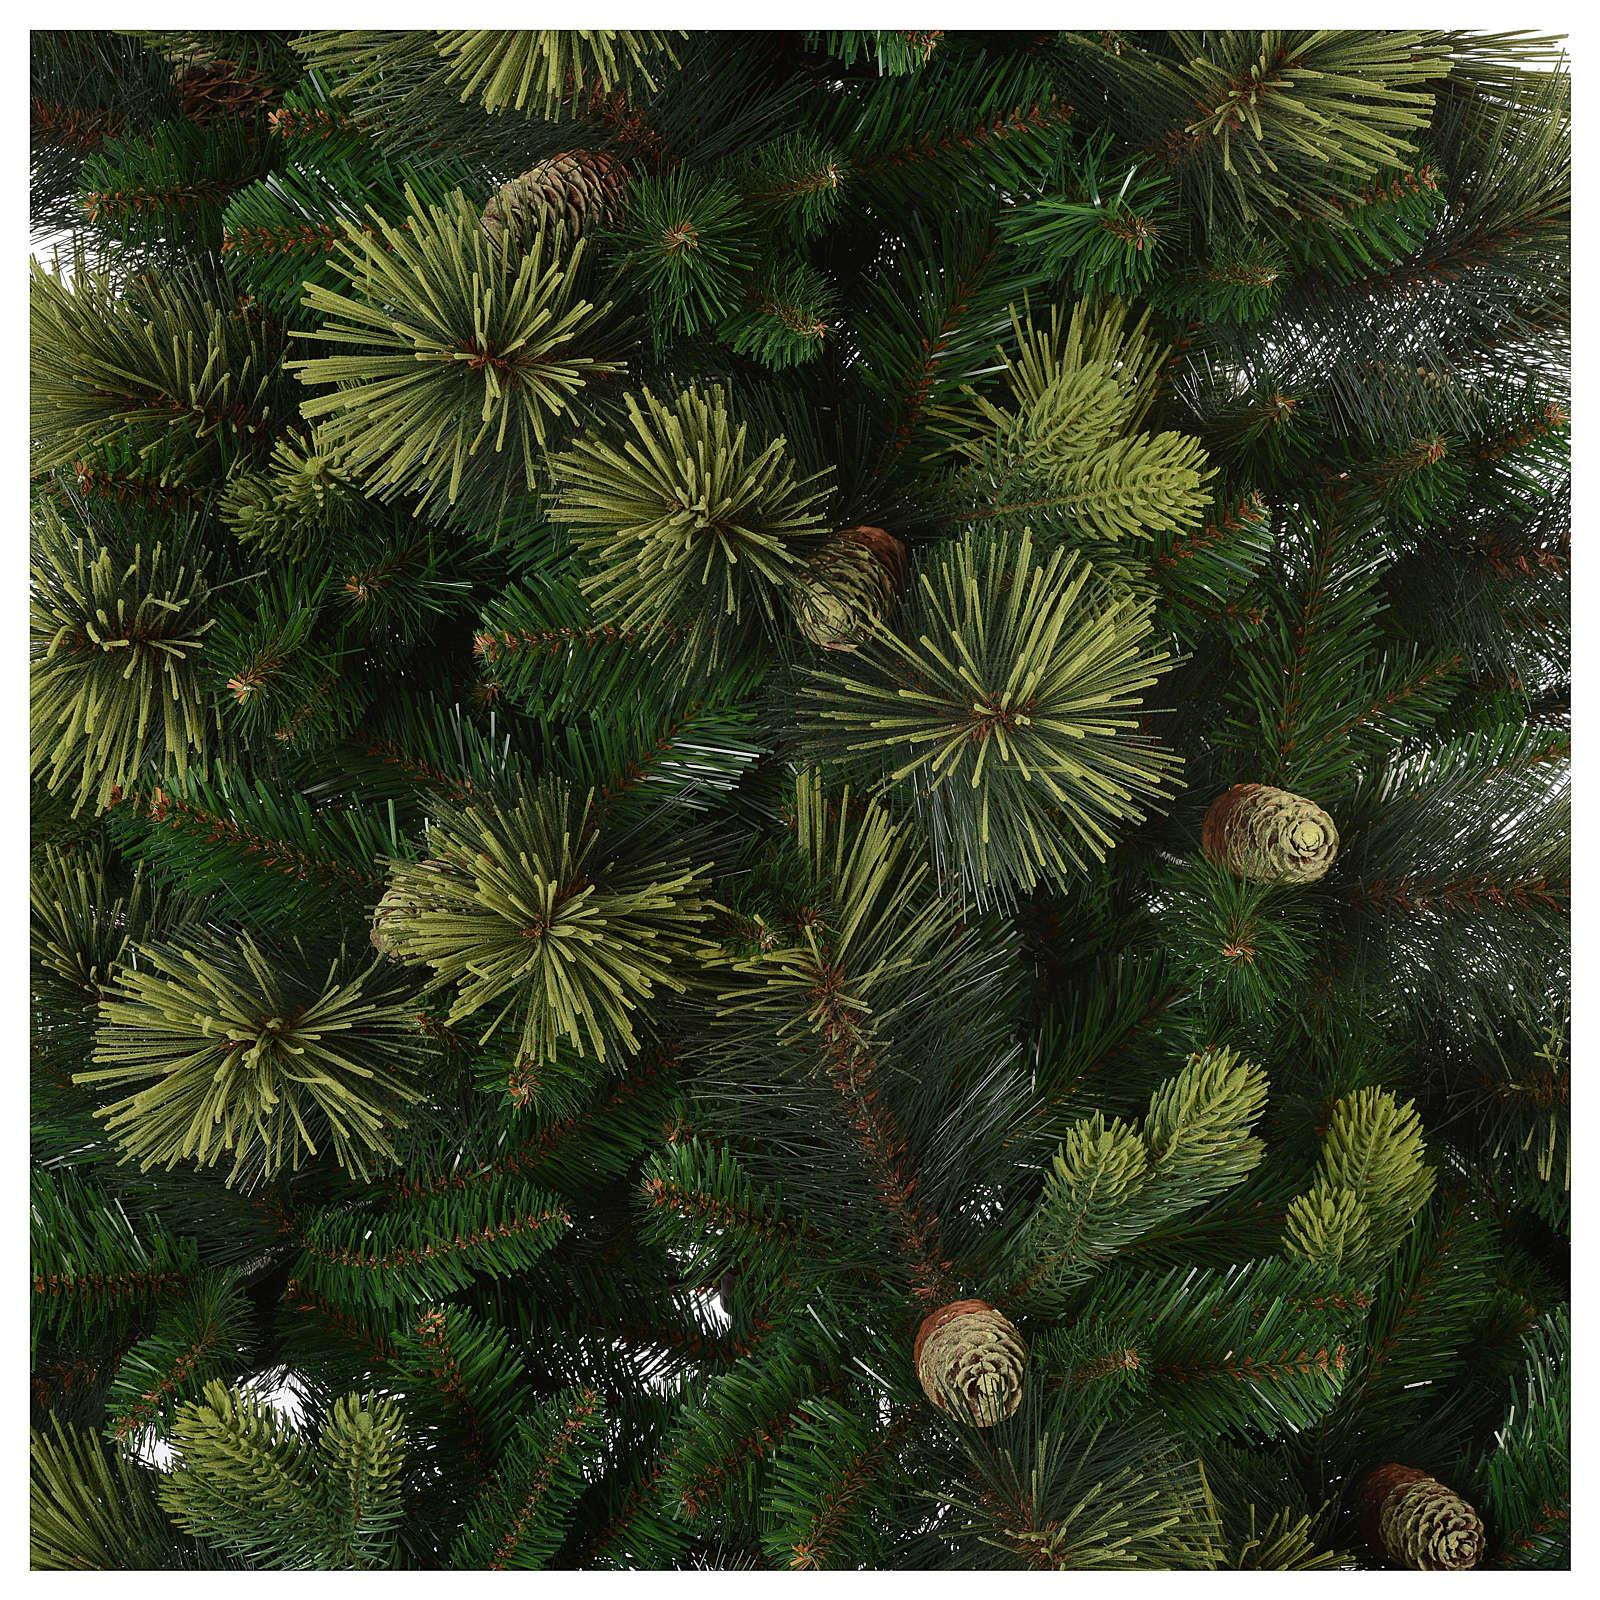 Sapin de Noël 210 cm vert avec pommes de pin modèle Carolina 3